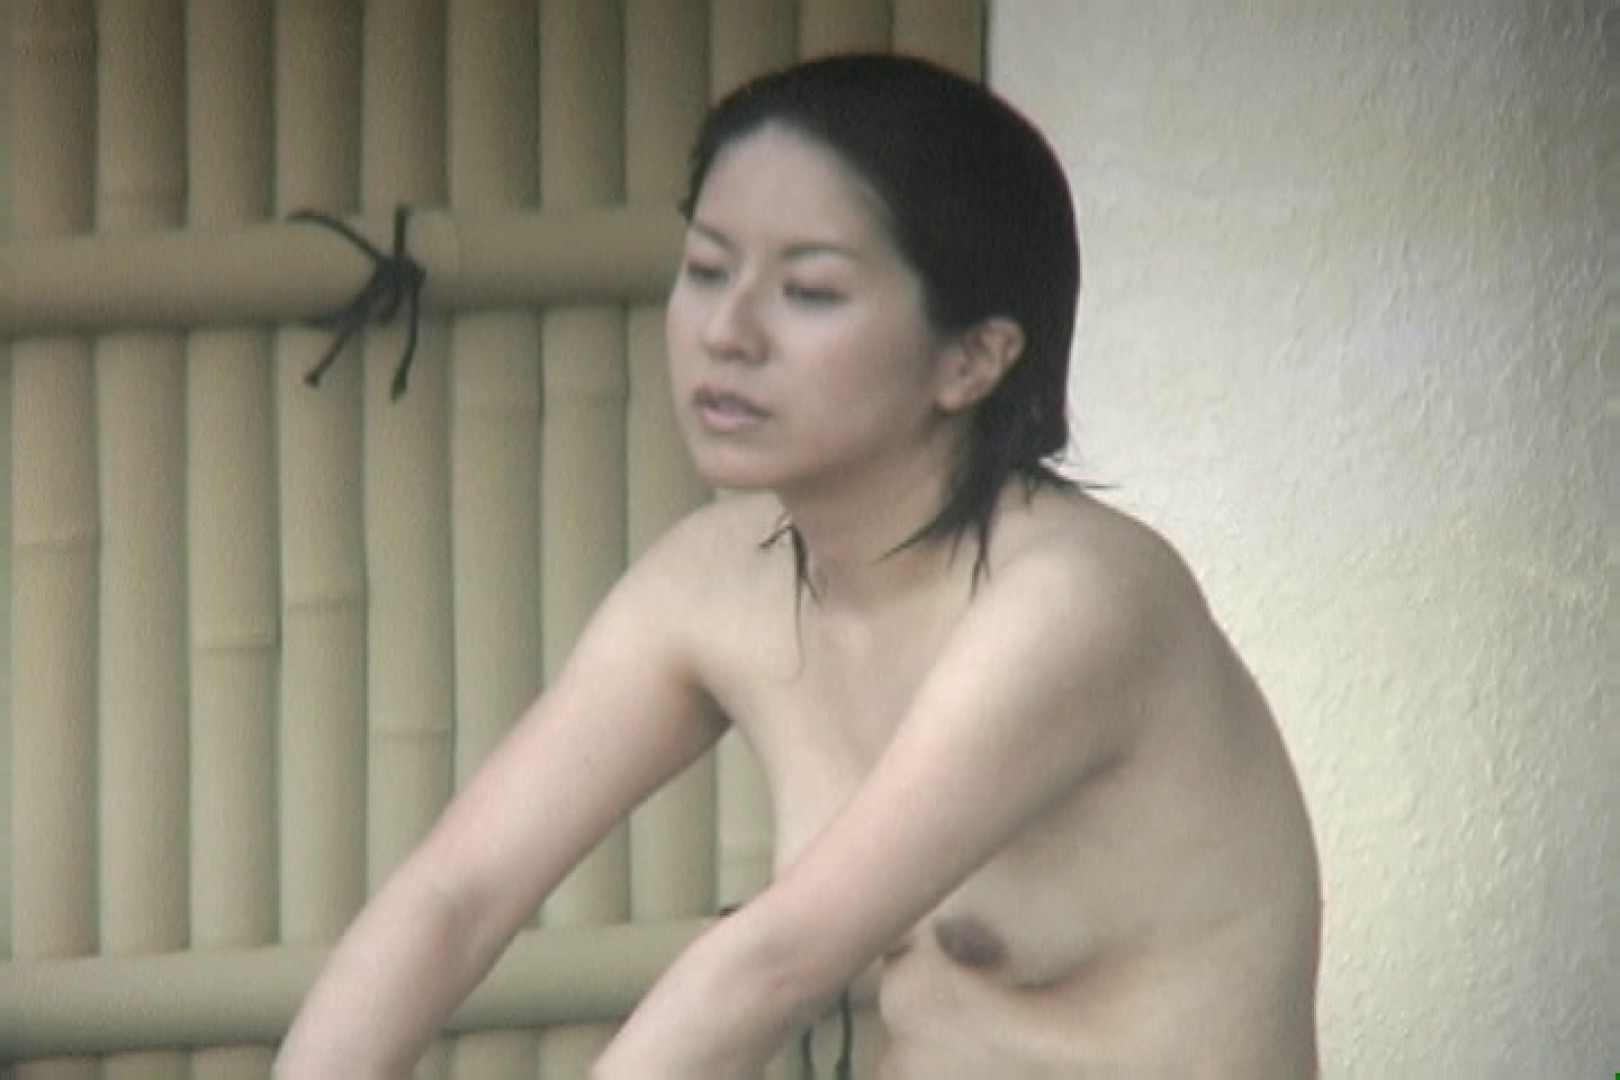 Aquaな露天風呂Vol.694 盗撮 | OLエロ画像  110PICs 19